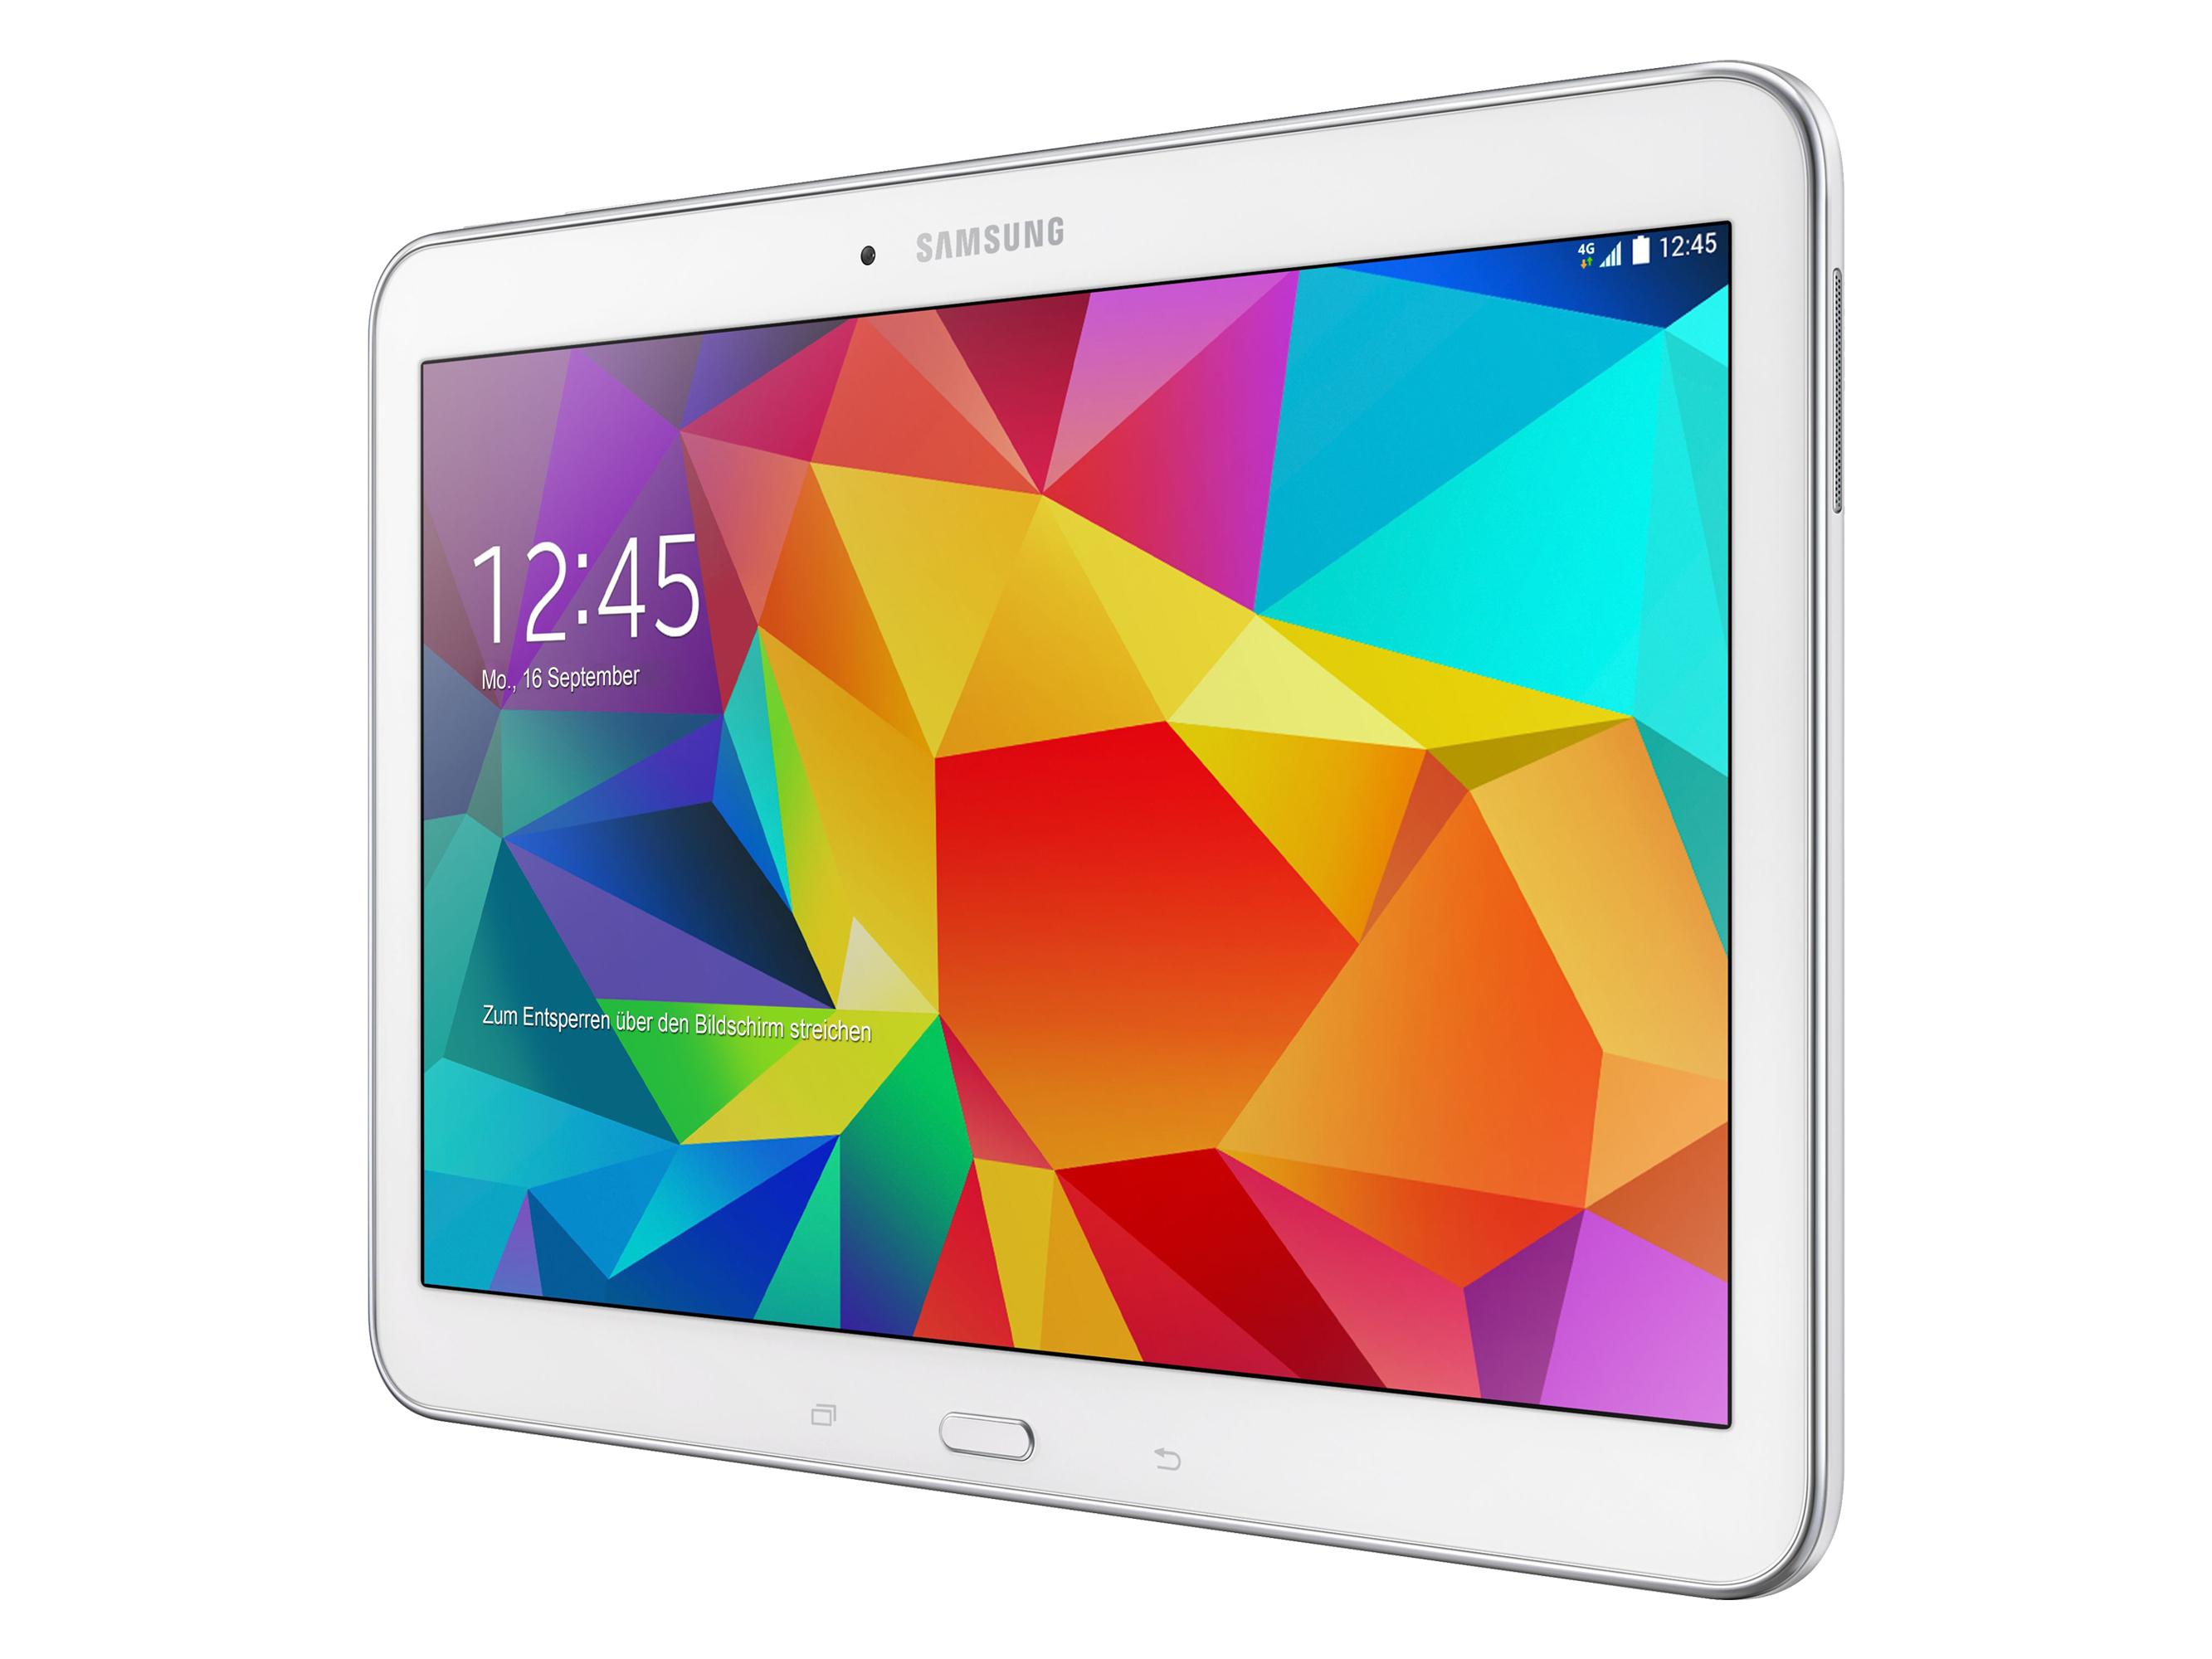 Samsung Galaxy Tab 4 10.1 Tablet Review